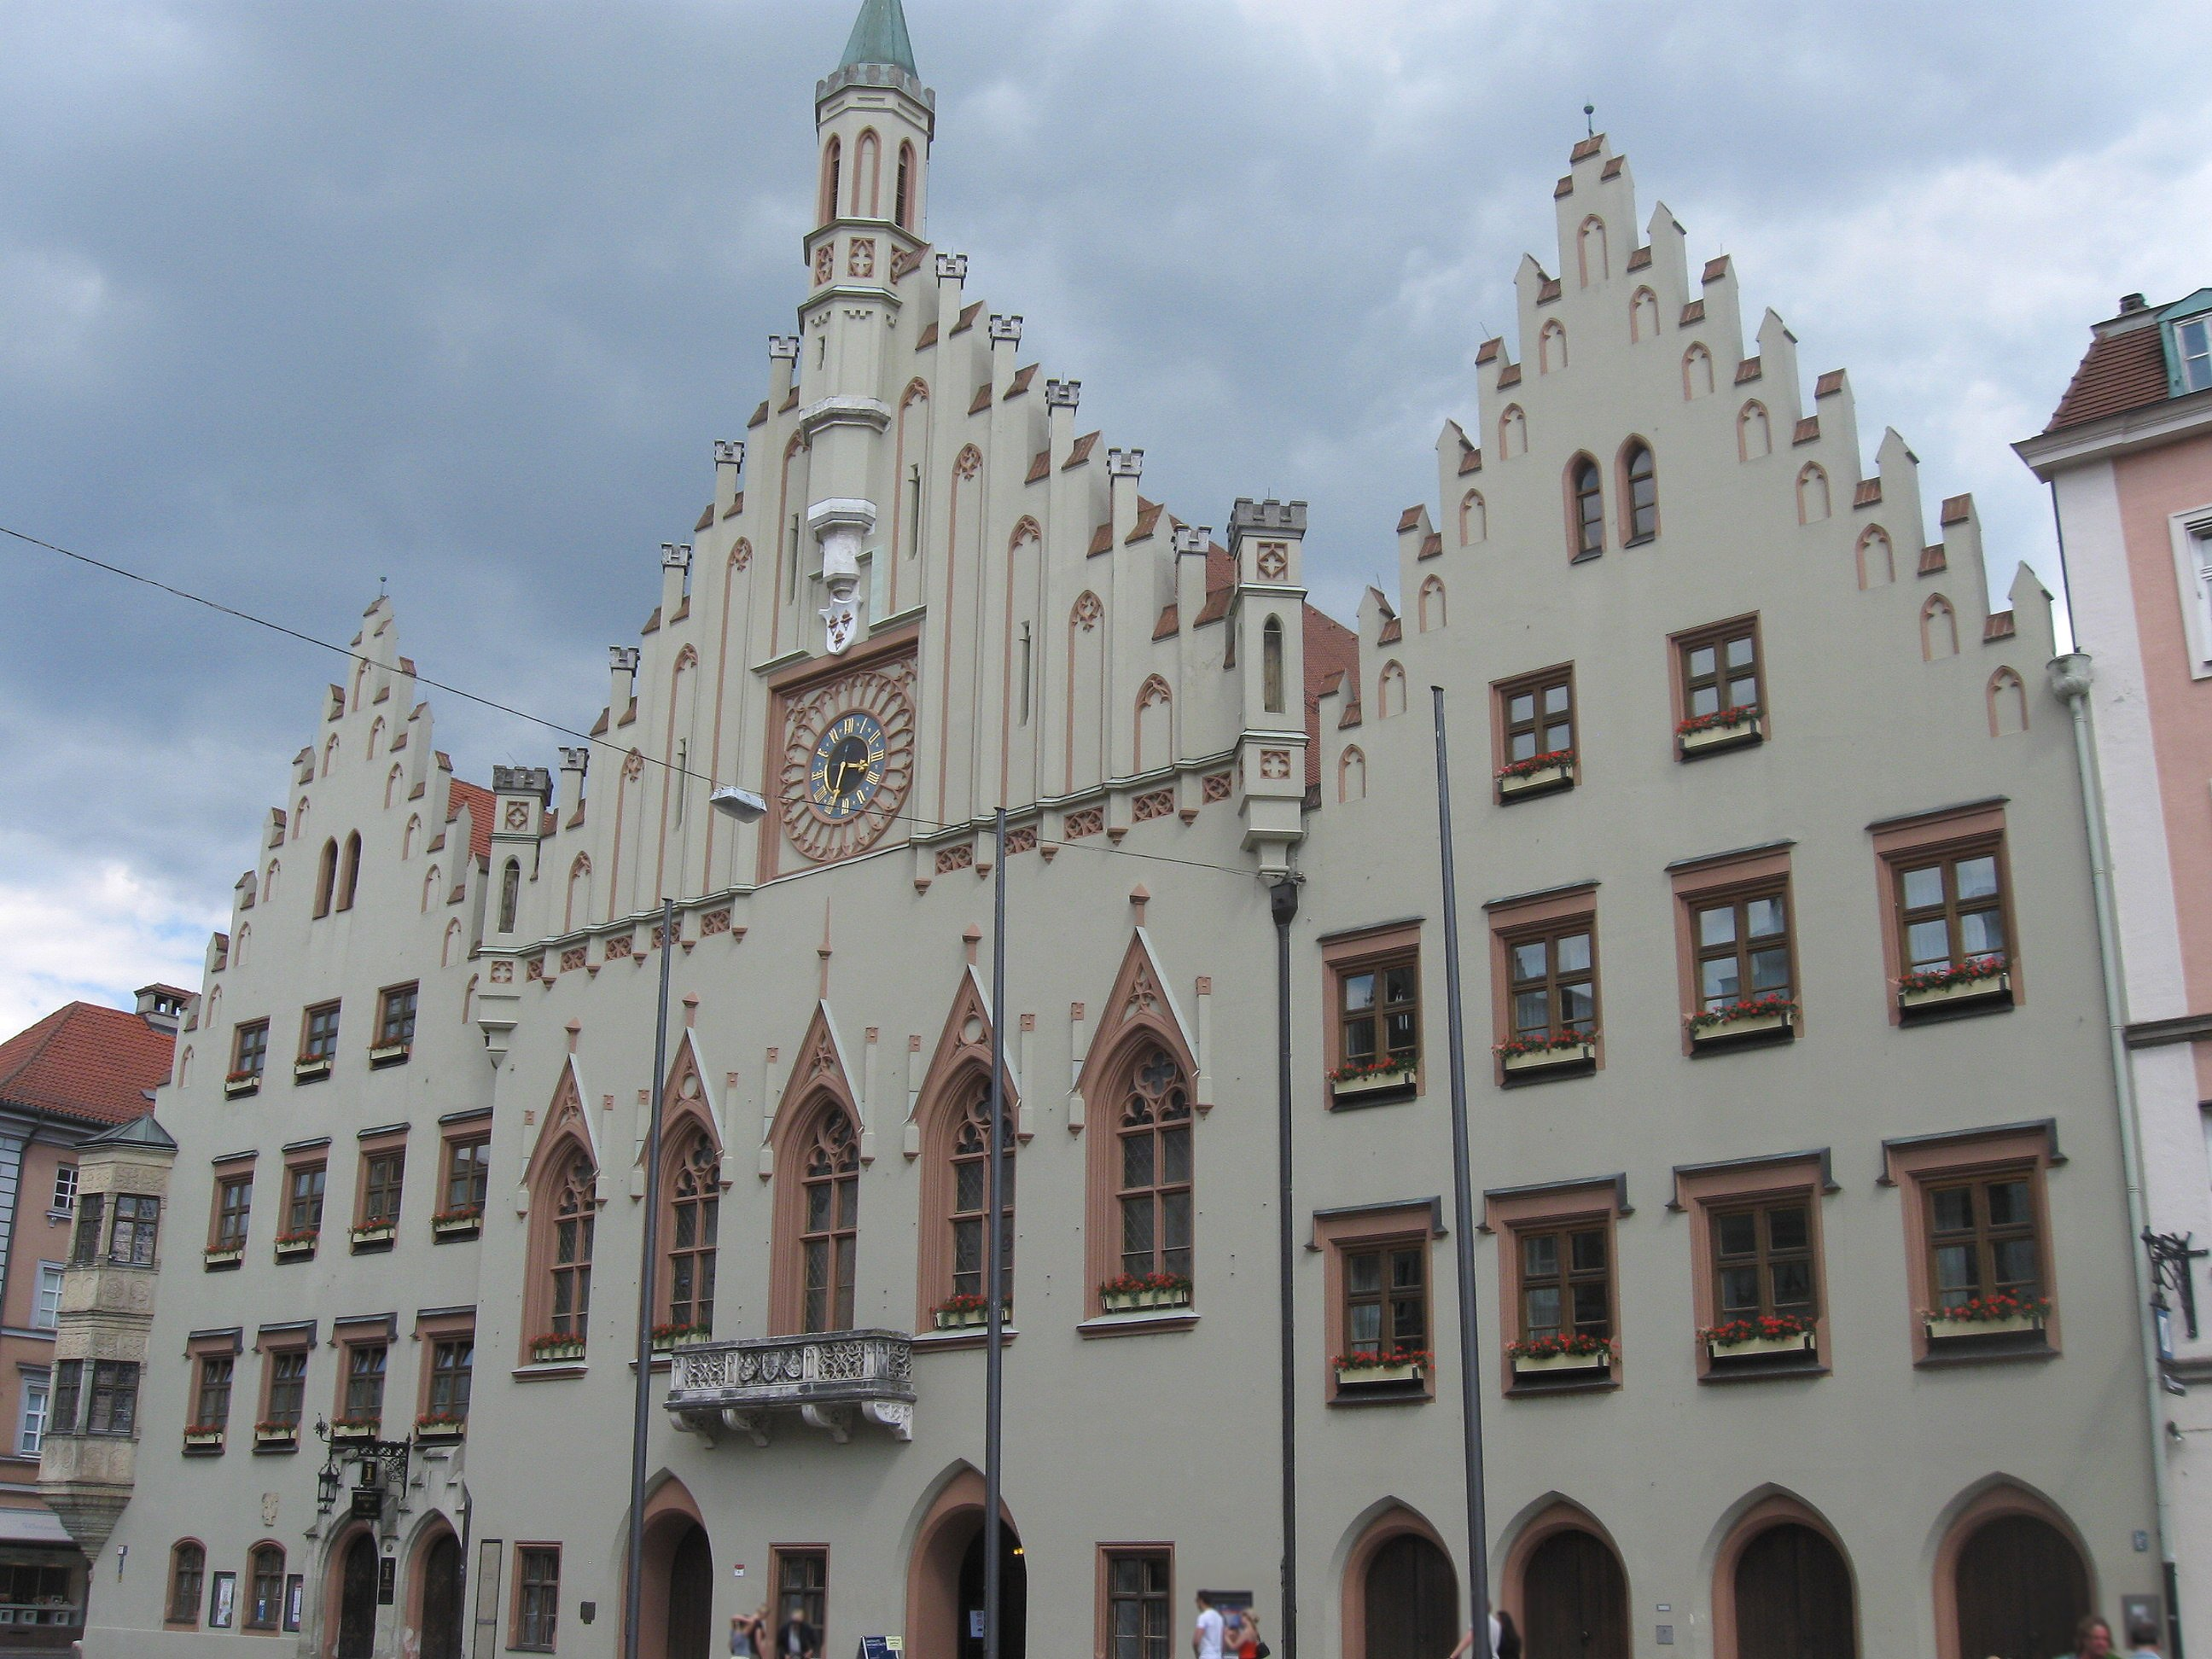 Liste der Baudenkmäler in Landshut Altstadt –